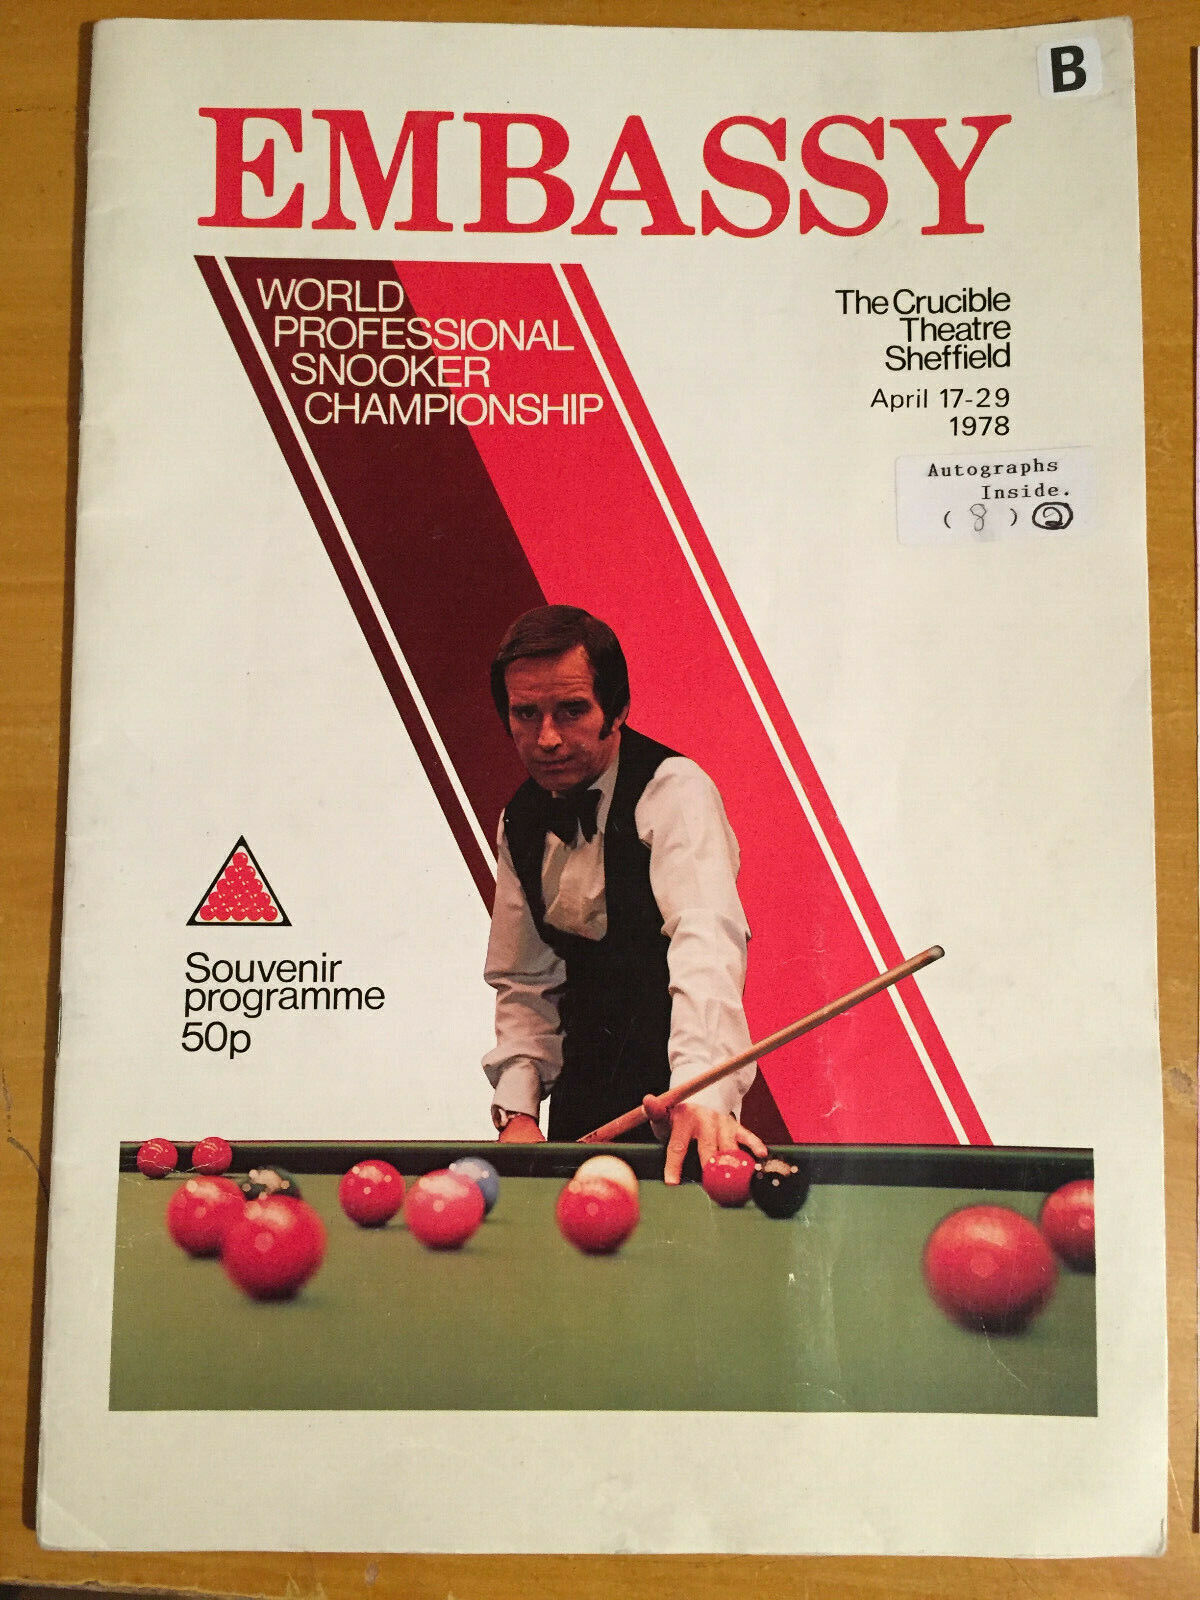 1978 Signed x 8 Embassy World Professional Snooker Championship Programme vgc